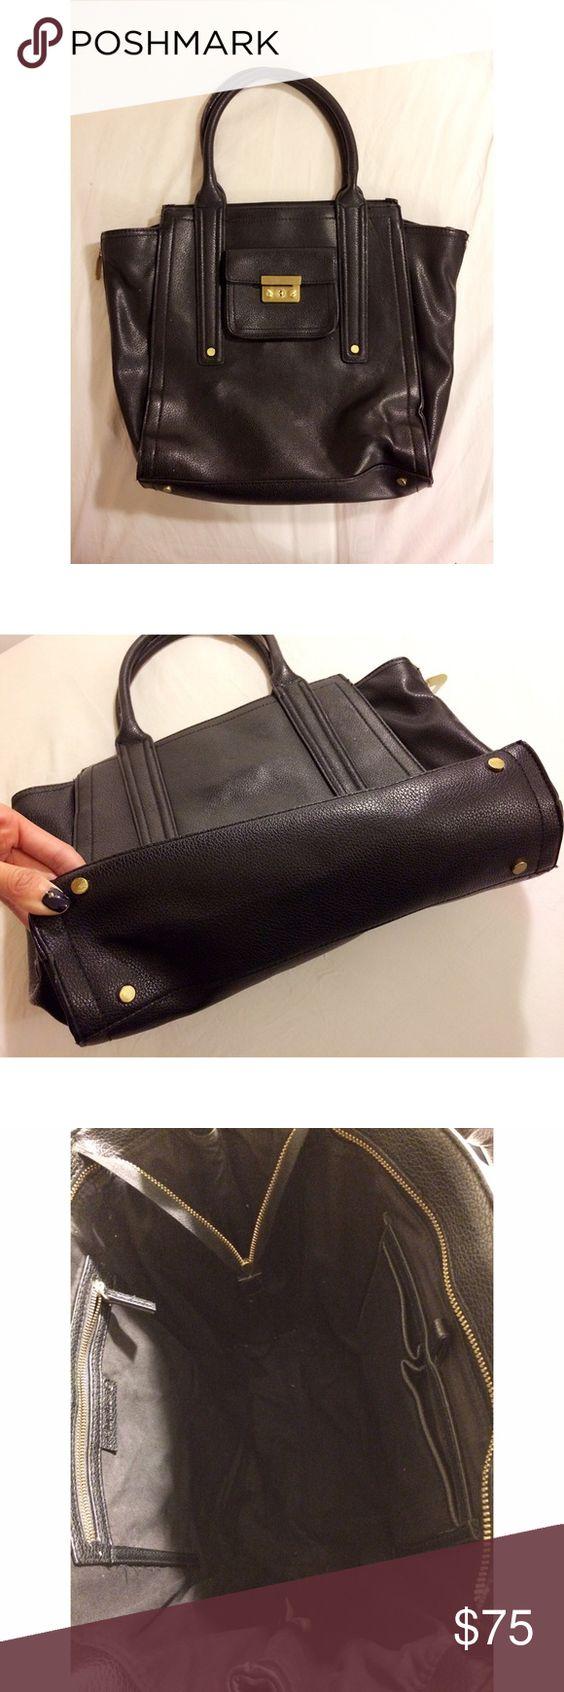 Large tote bags at target - Phillip Lim For Target Large Asymmetrical Black Vegan Leather Satchel Tote Bag Handbag Purse Carryall Zippers On Sides For Expansion